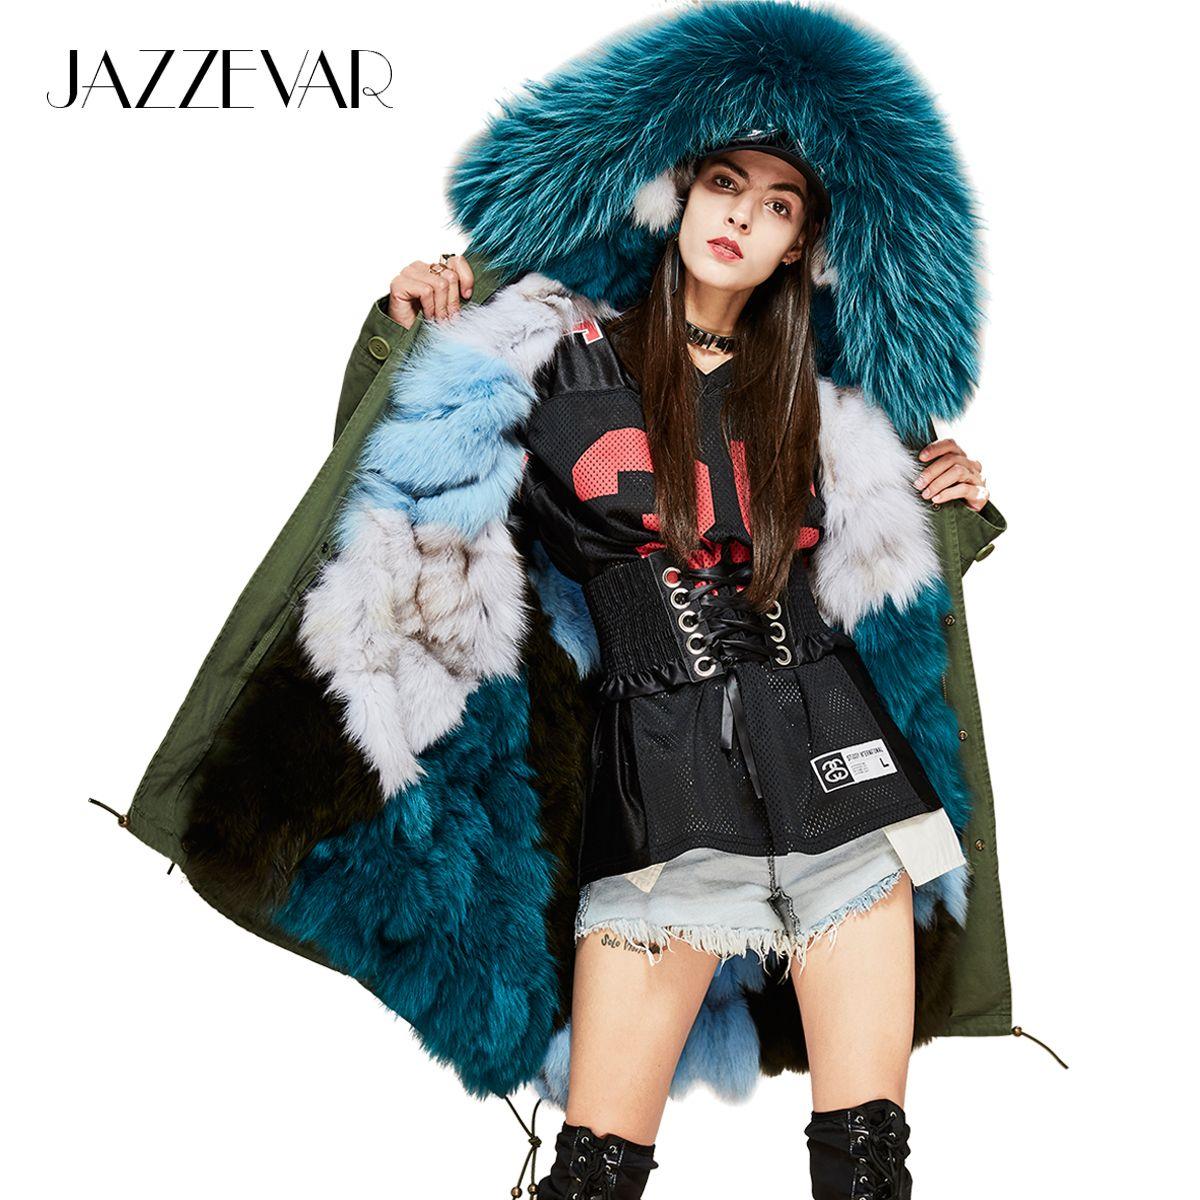 JAZZEVAR New Fashion Woman Luxurious Real Fox fur lining Military Parka MIDI Large Raccoon fur Hooded Coat Outwear Winter Jacket